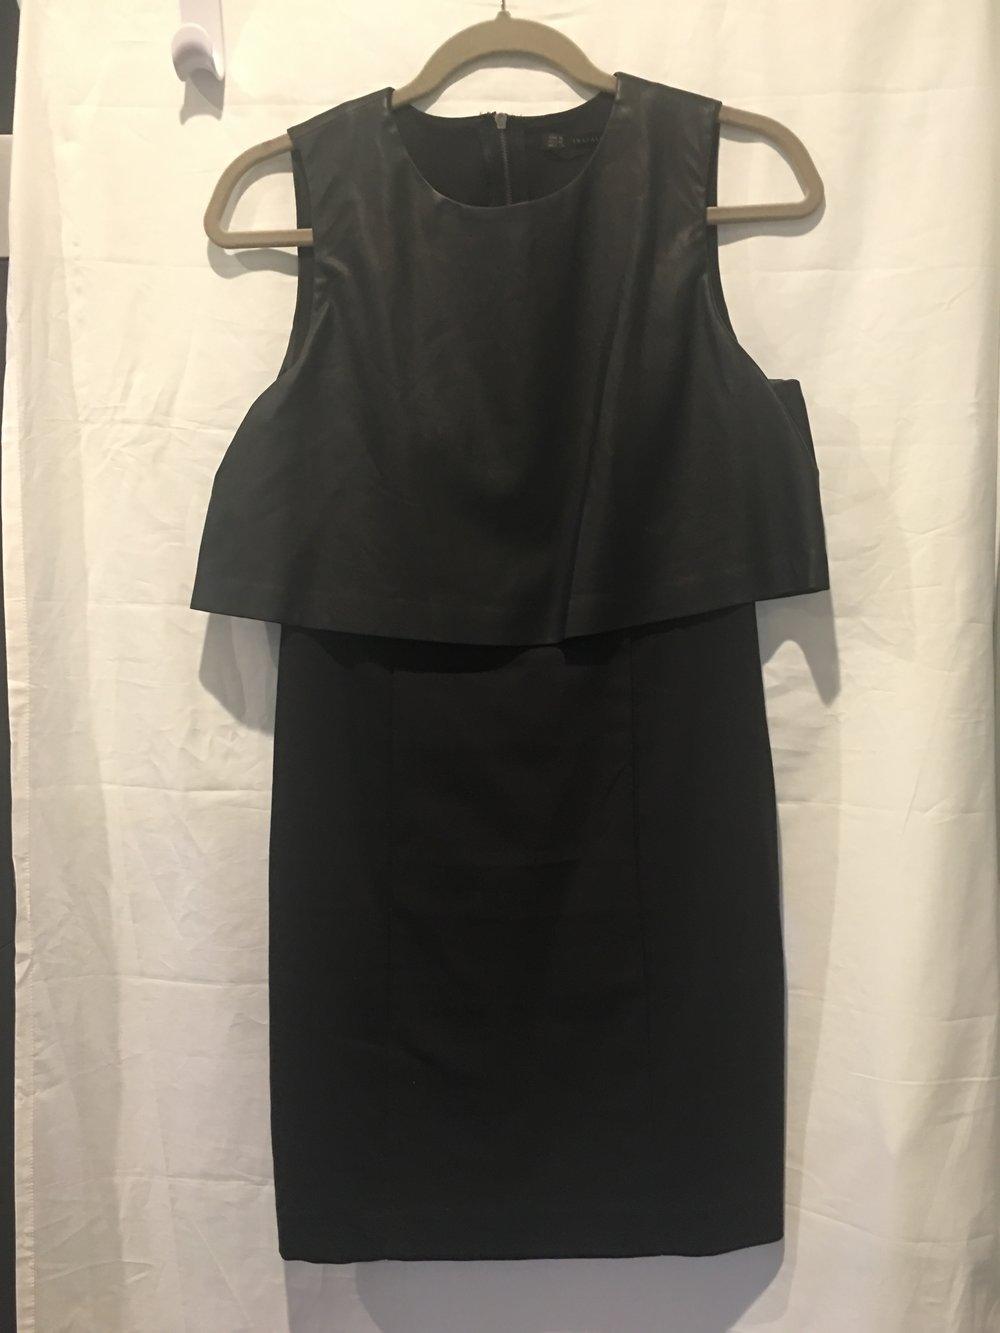 Zara Black Leather top dress (faux 2 piece).jpg